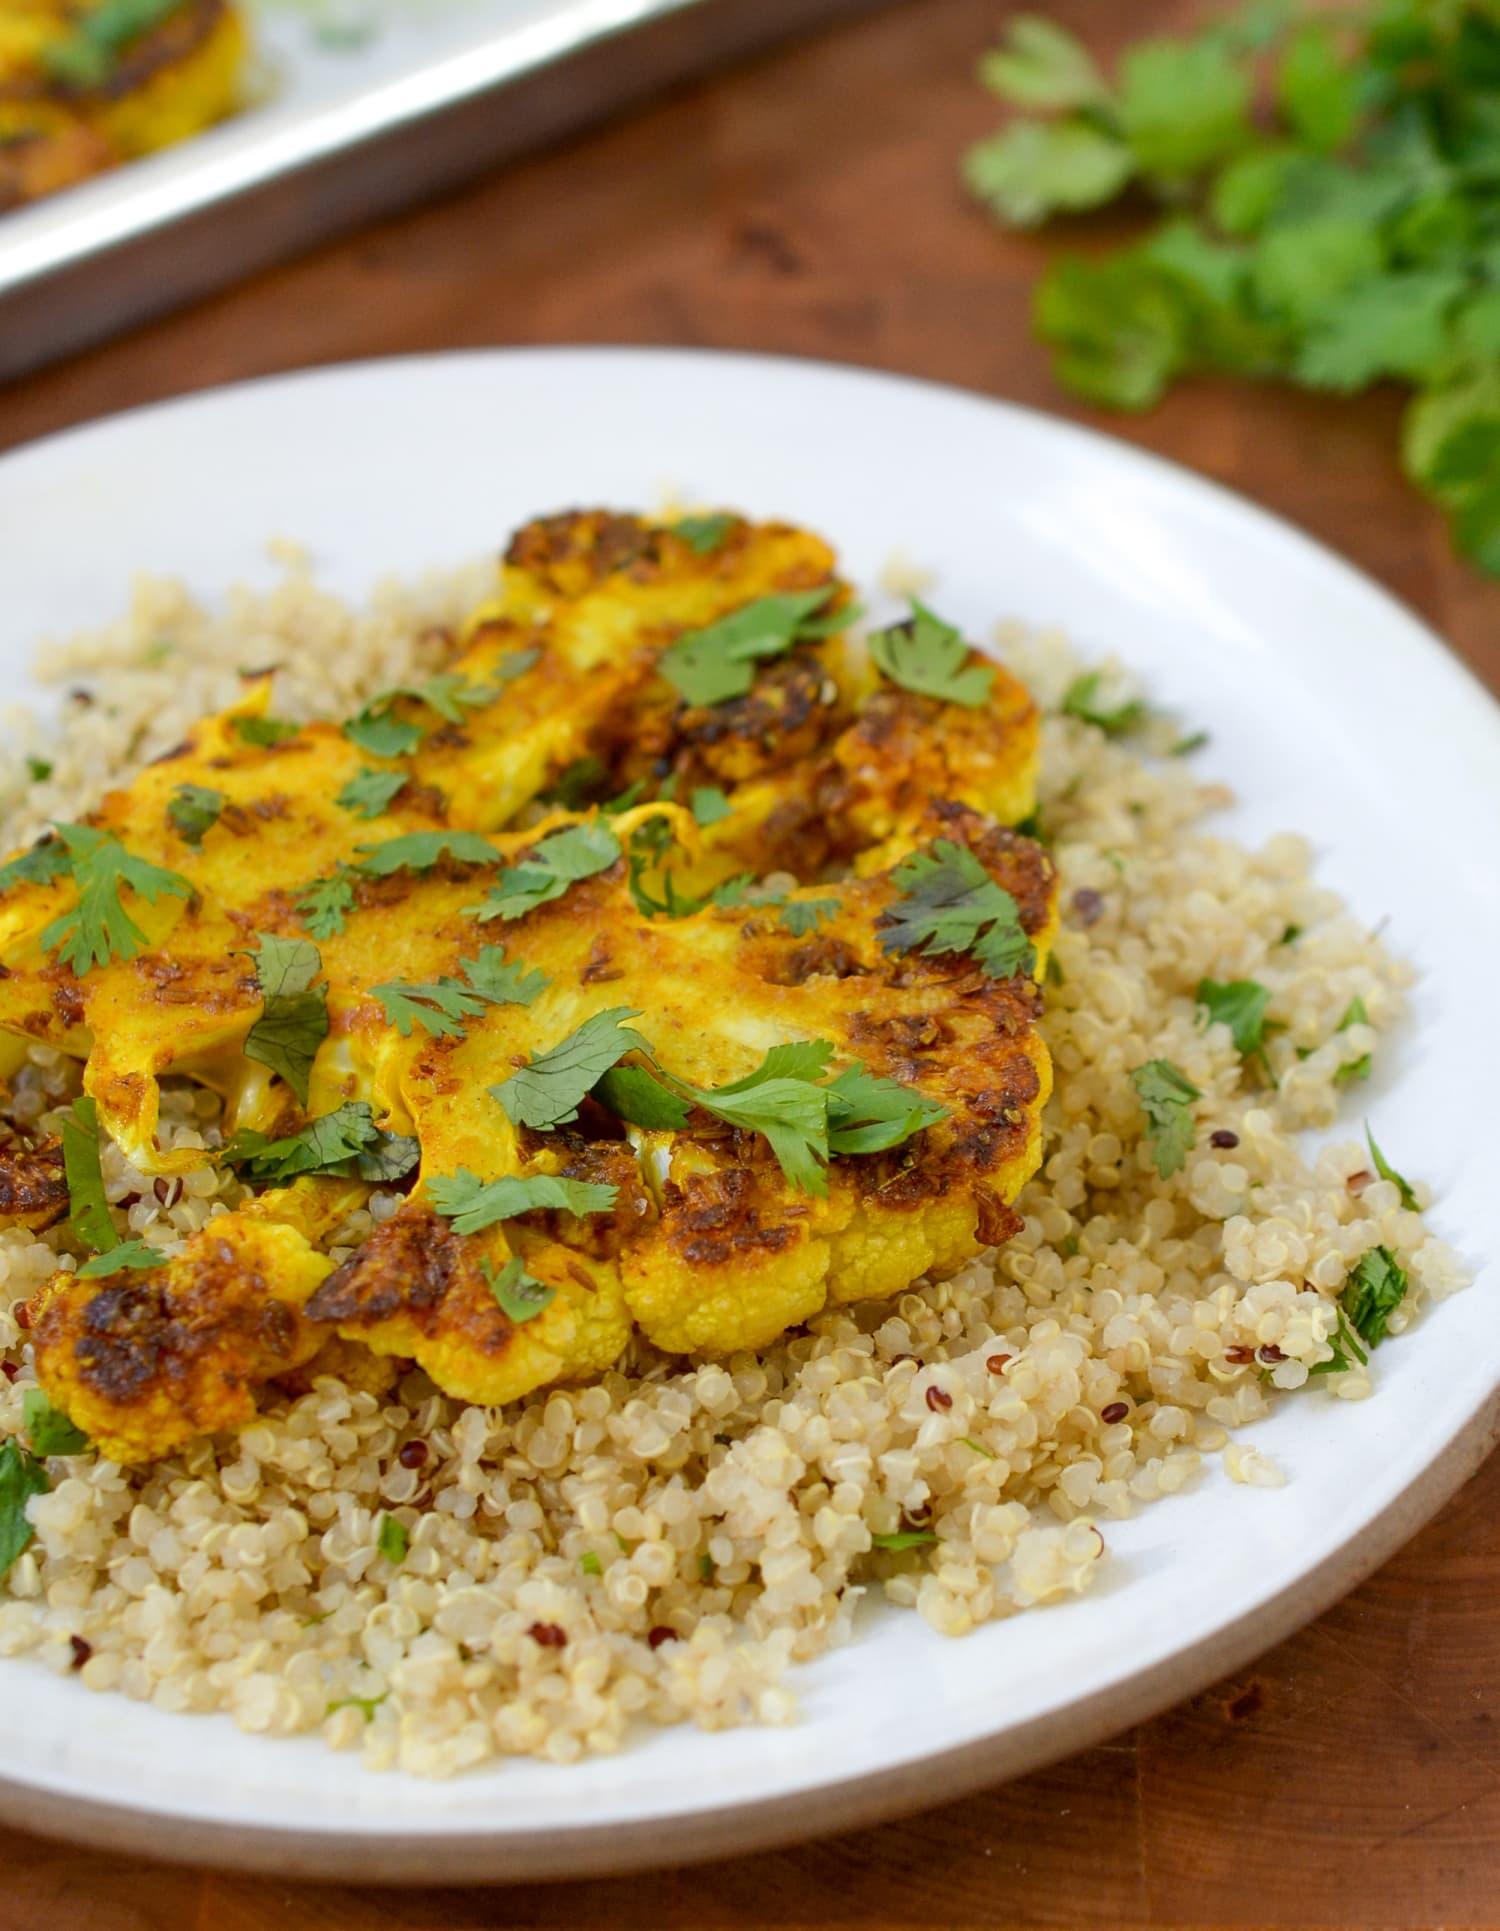 Recipe: Cauliflower Steaks with Ginger, Turmeric, and Cumin